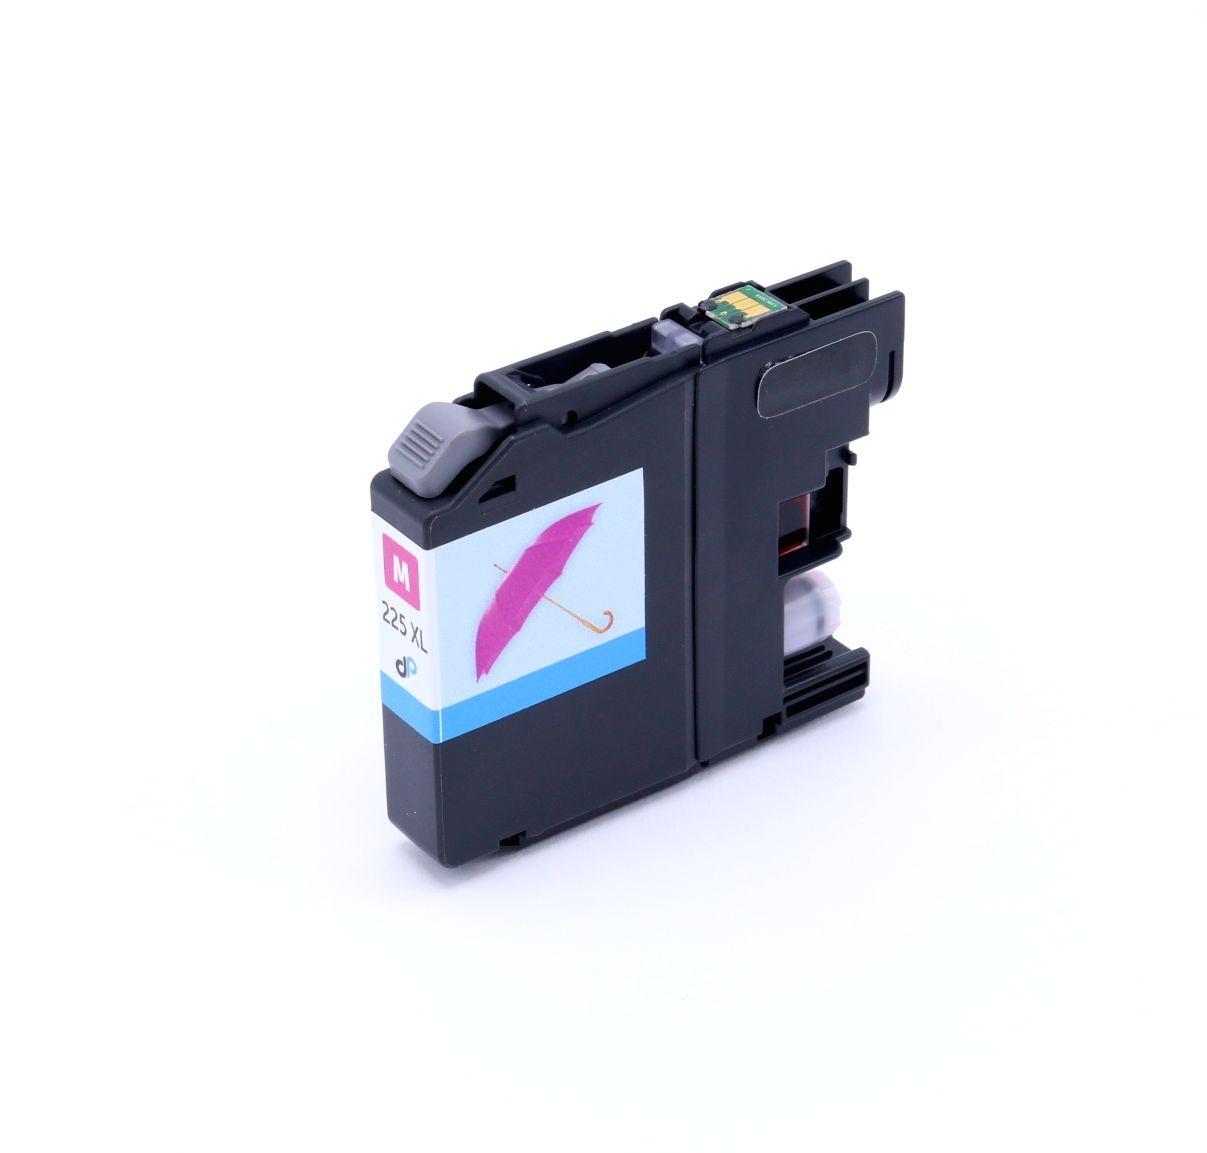 Kompatibel zu Brother LC225XLM Tinte magenta 11,8 ml